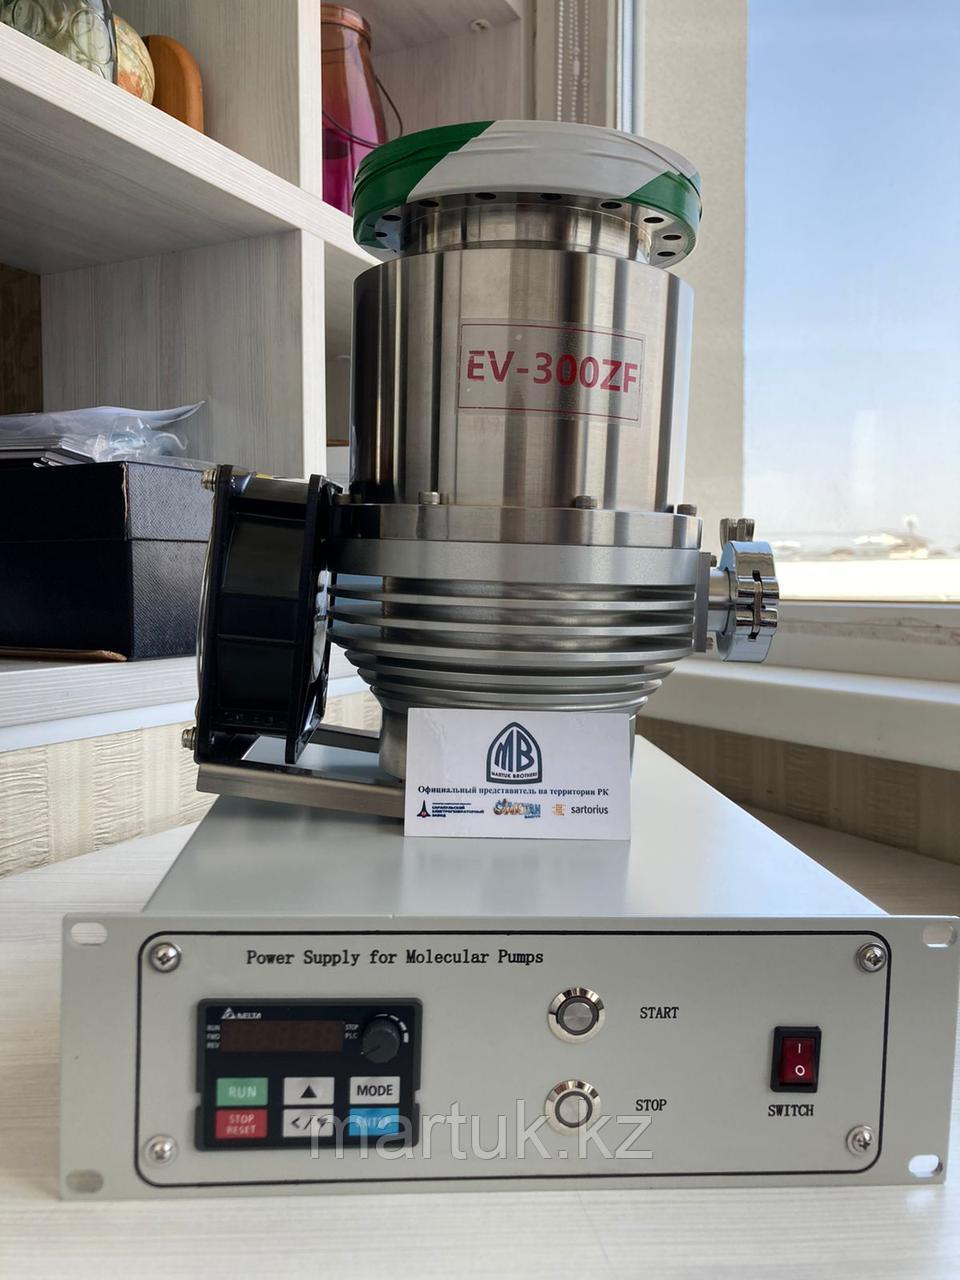 Турбомолекулярный насос EV-300ZF